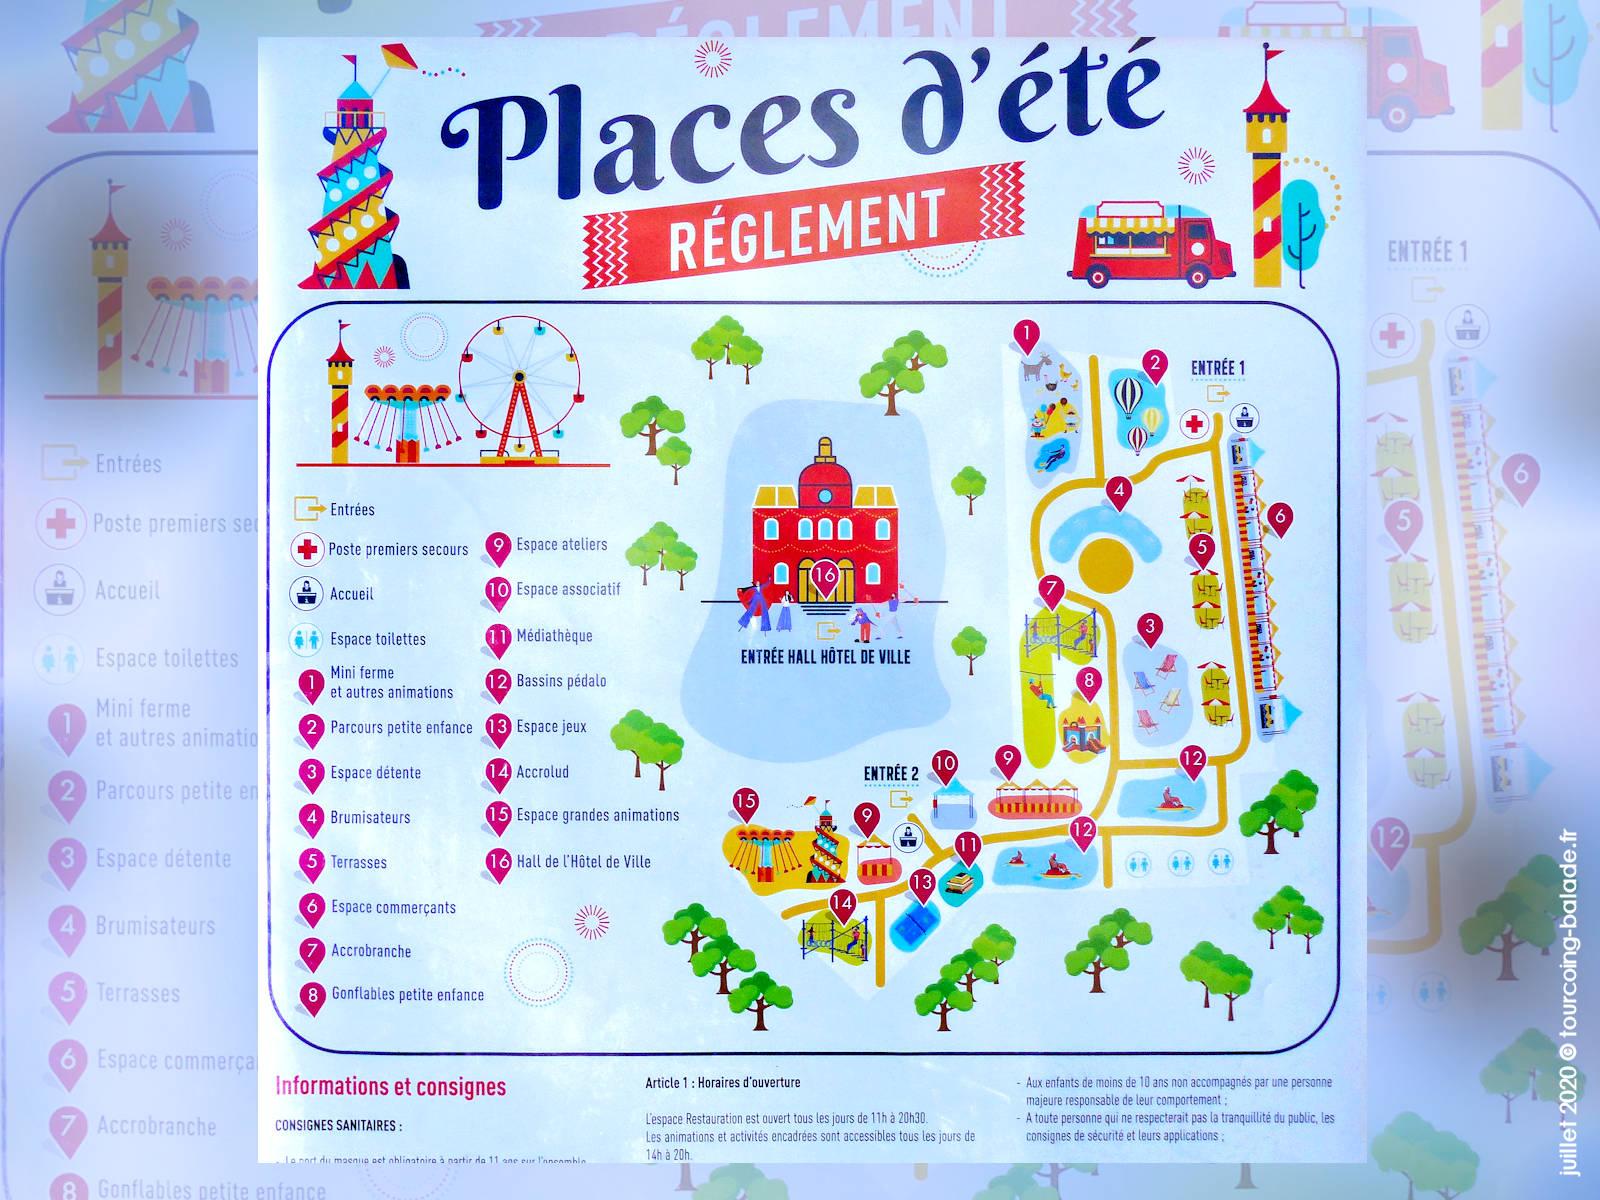 Tourcoing Places d'Été, juillet Août 2020